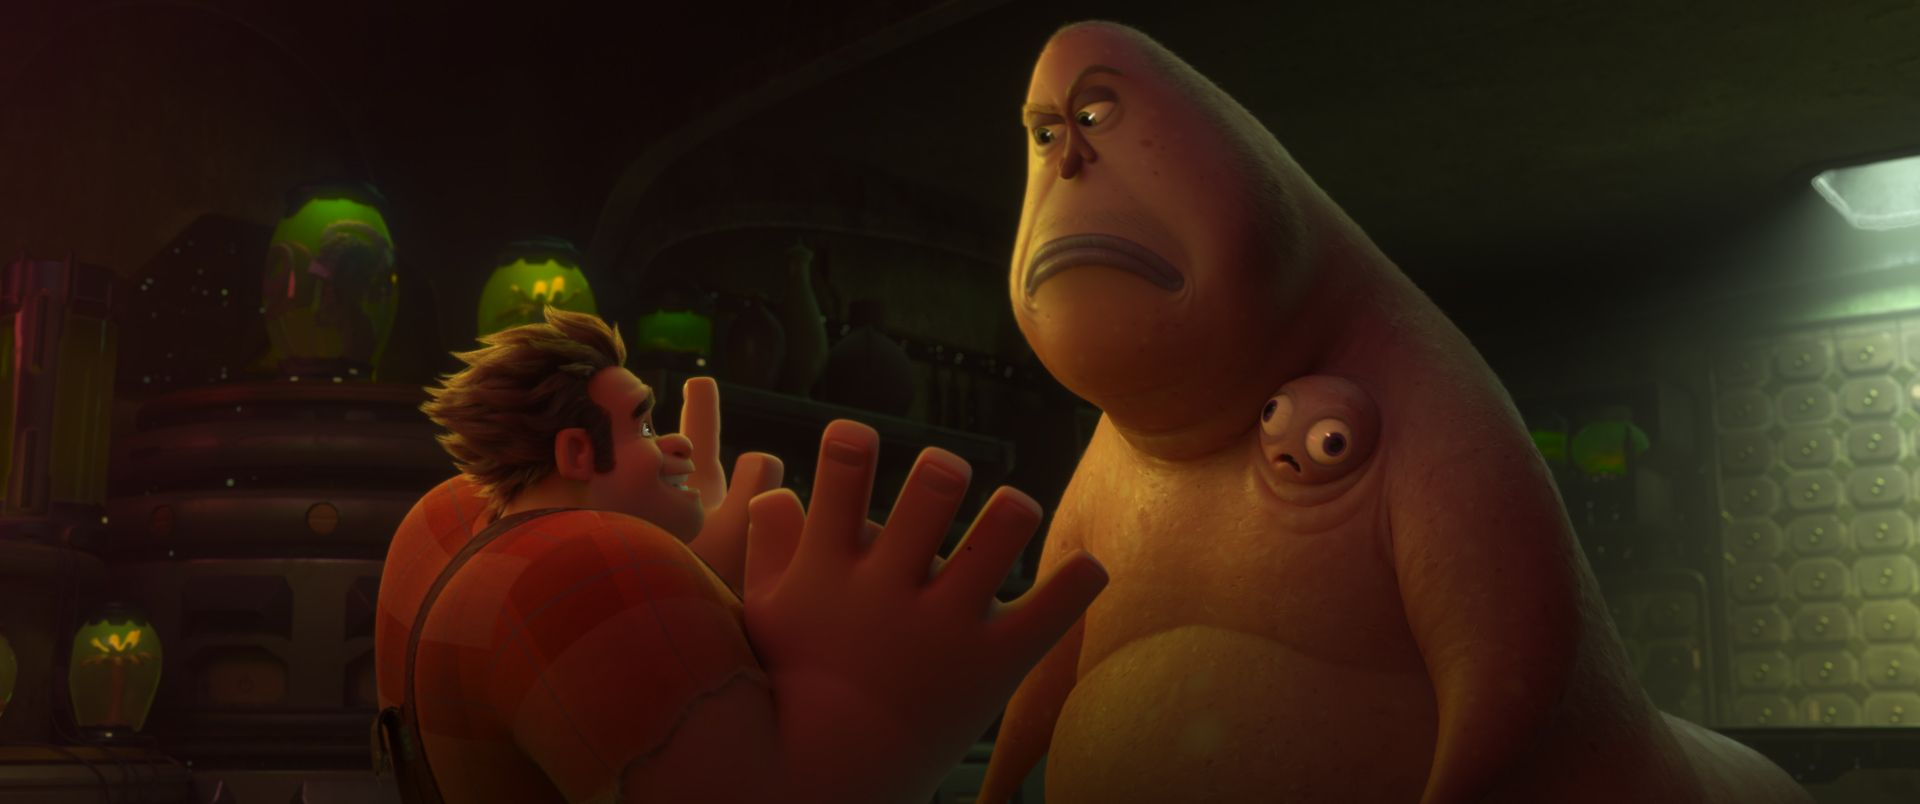 New 'Ralph Breaks the Internet' Trailer Gets Weird on the Internet